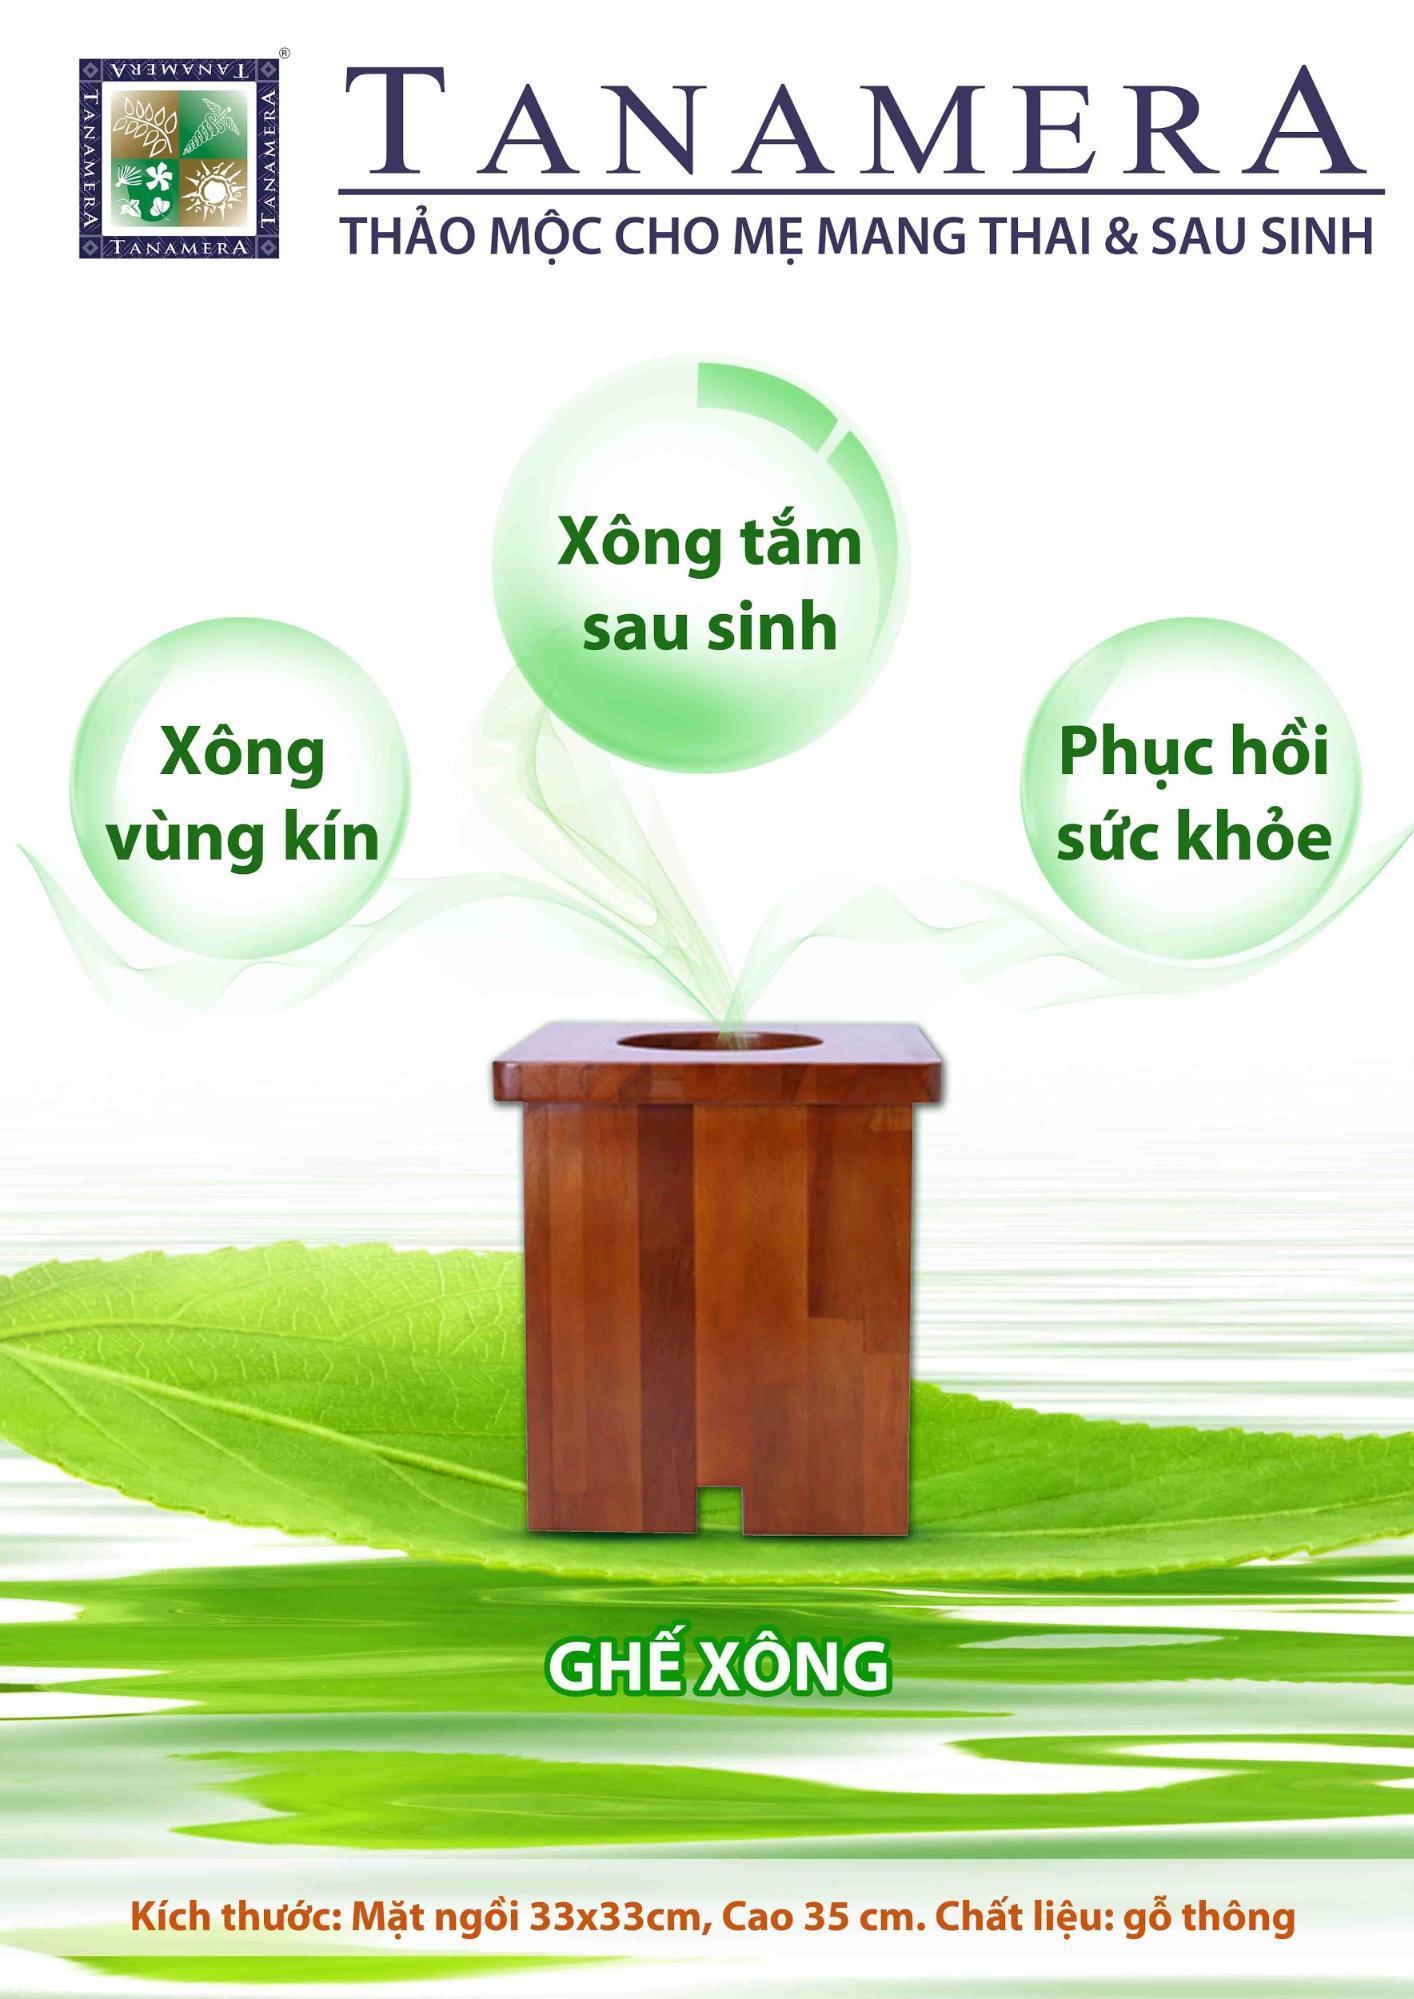 ghe-xong-vung-kin-giup-chi-em-tien-loi-hon-trong-qua-trinh-xong-hoi